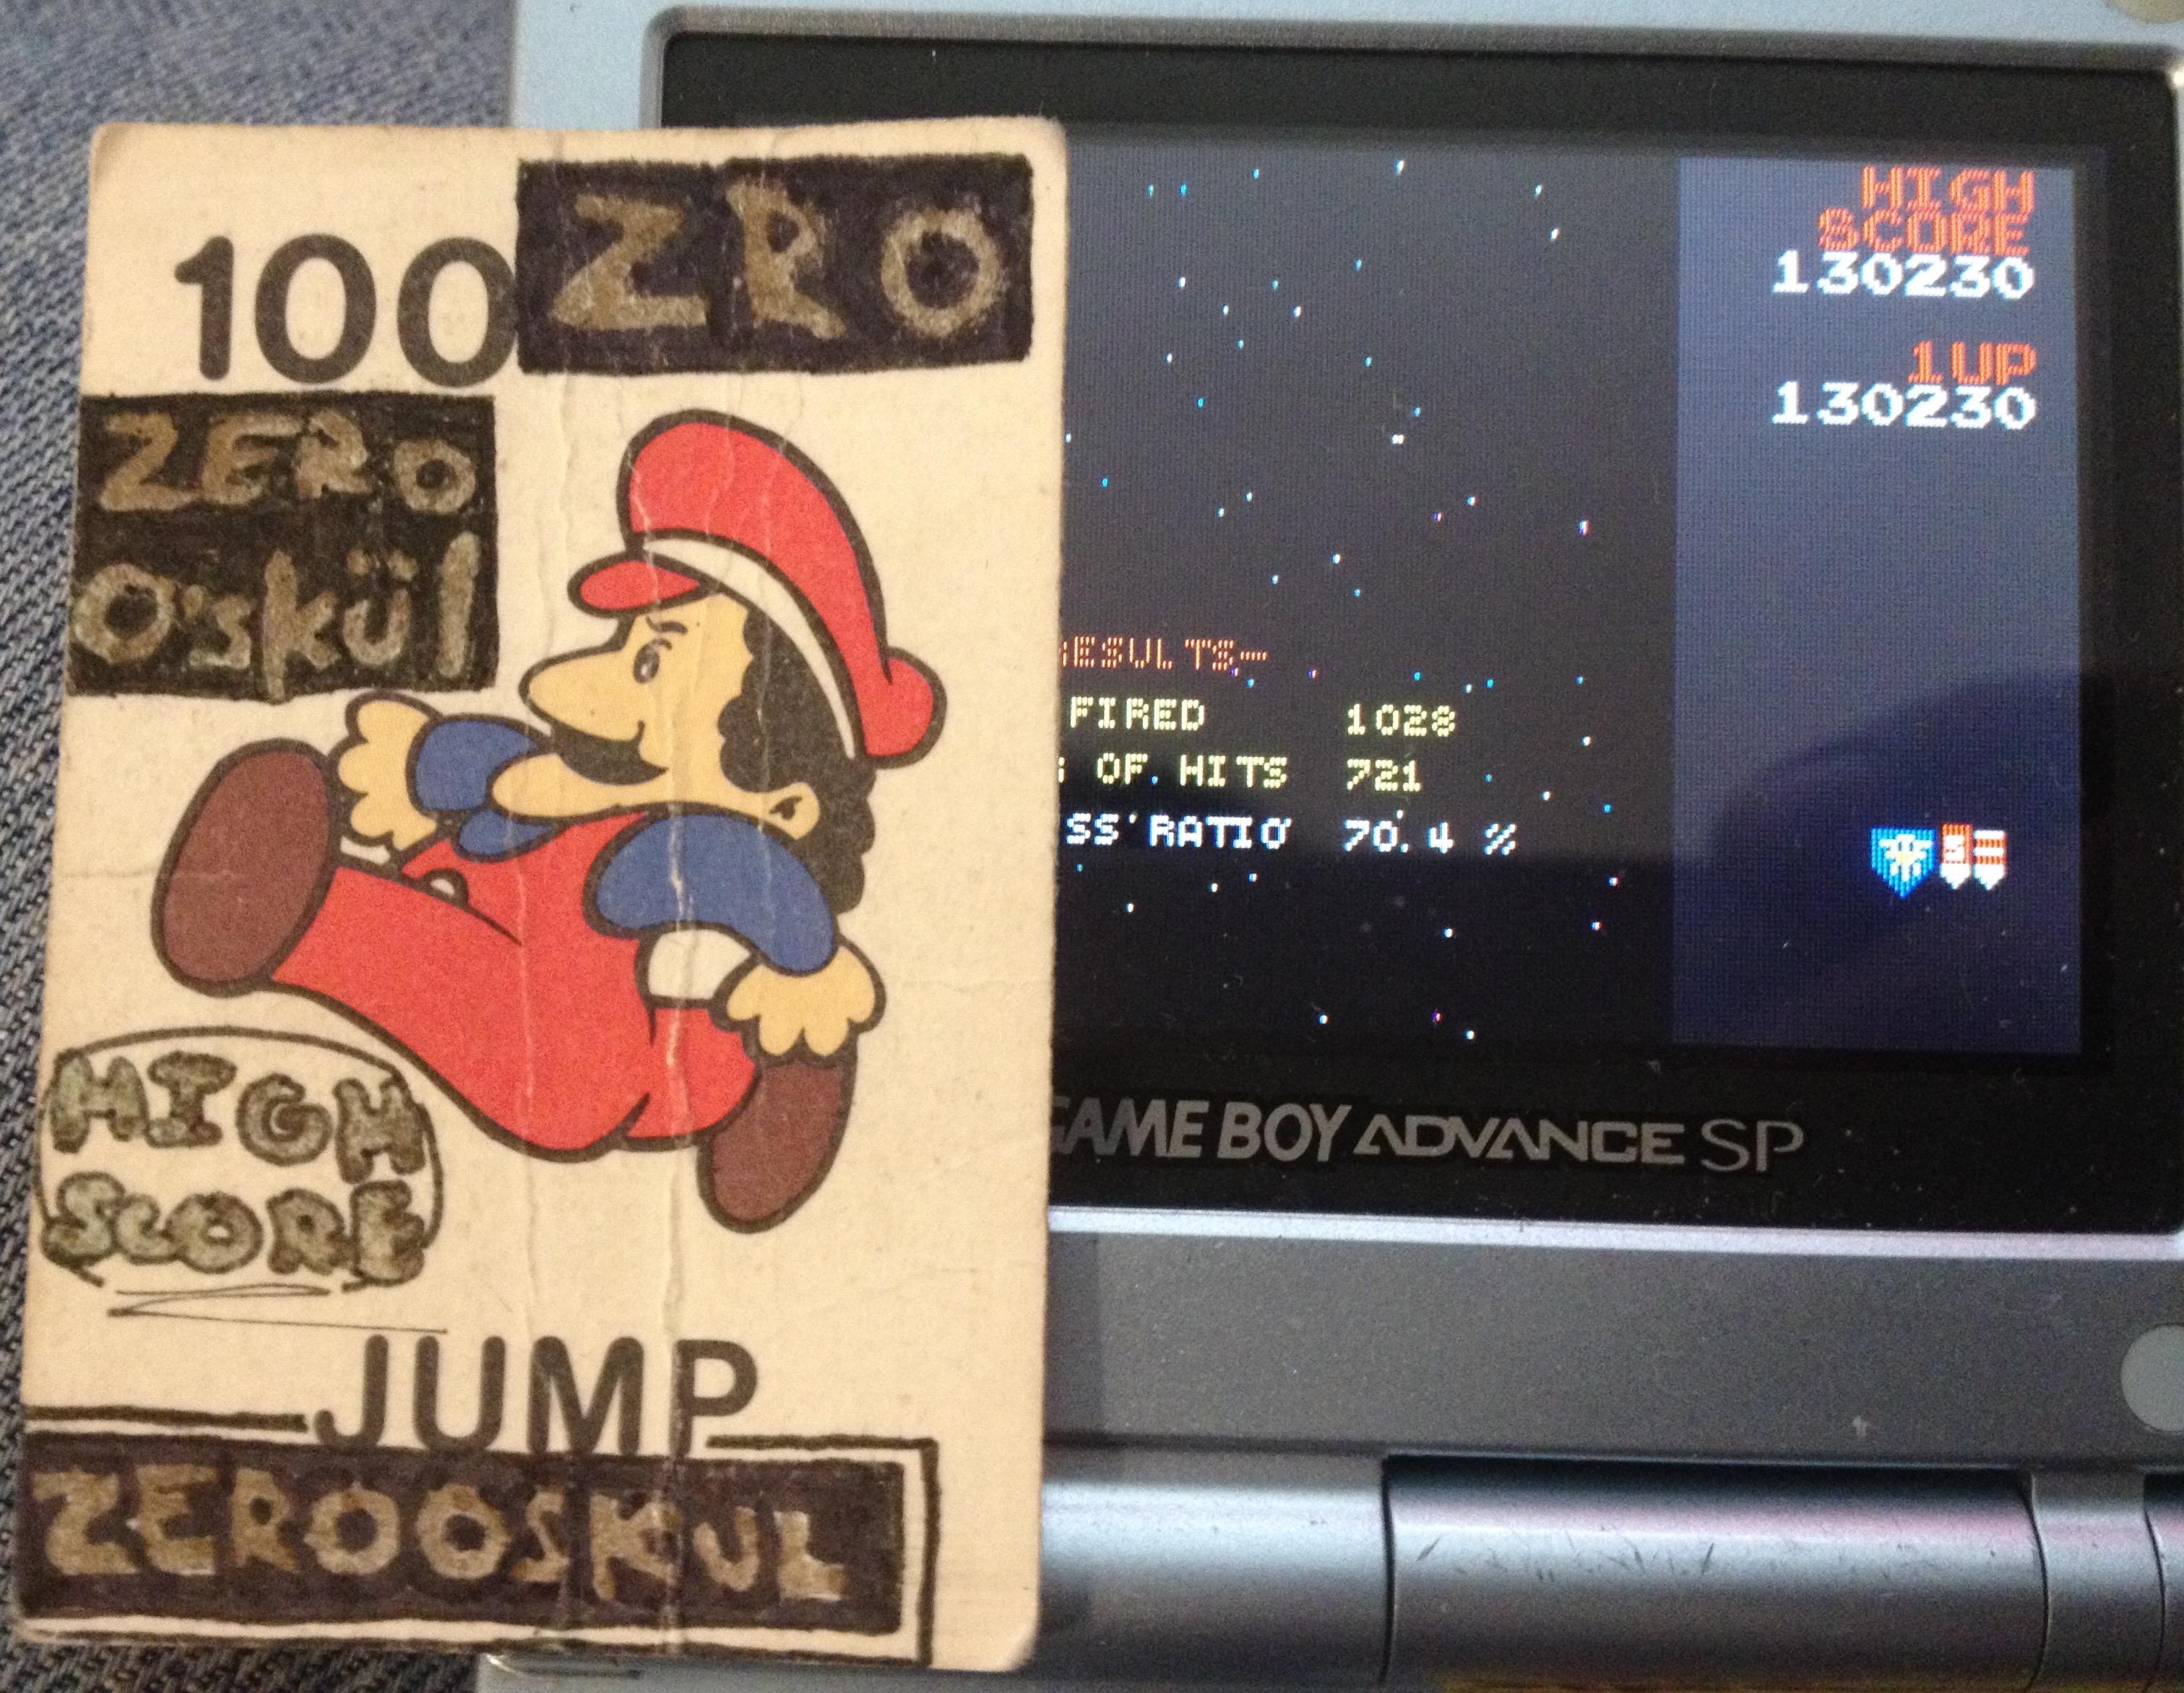 zerooskul: Namco Museum: Galaga (GBA) 130,230 points on 2019-06-09 14:26:14